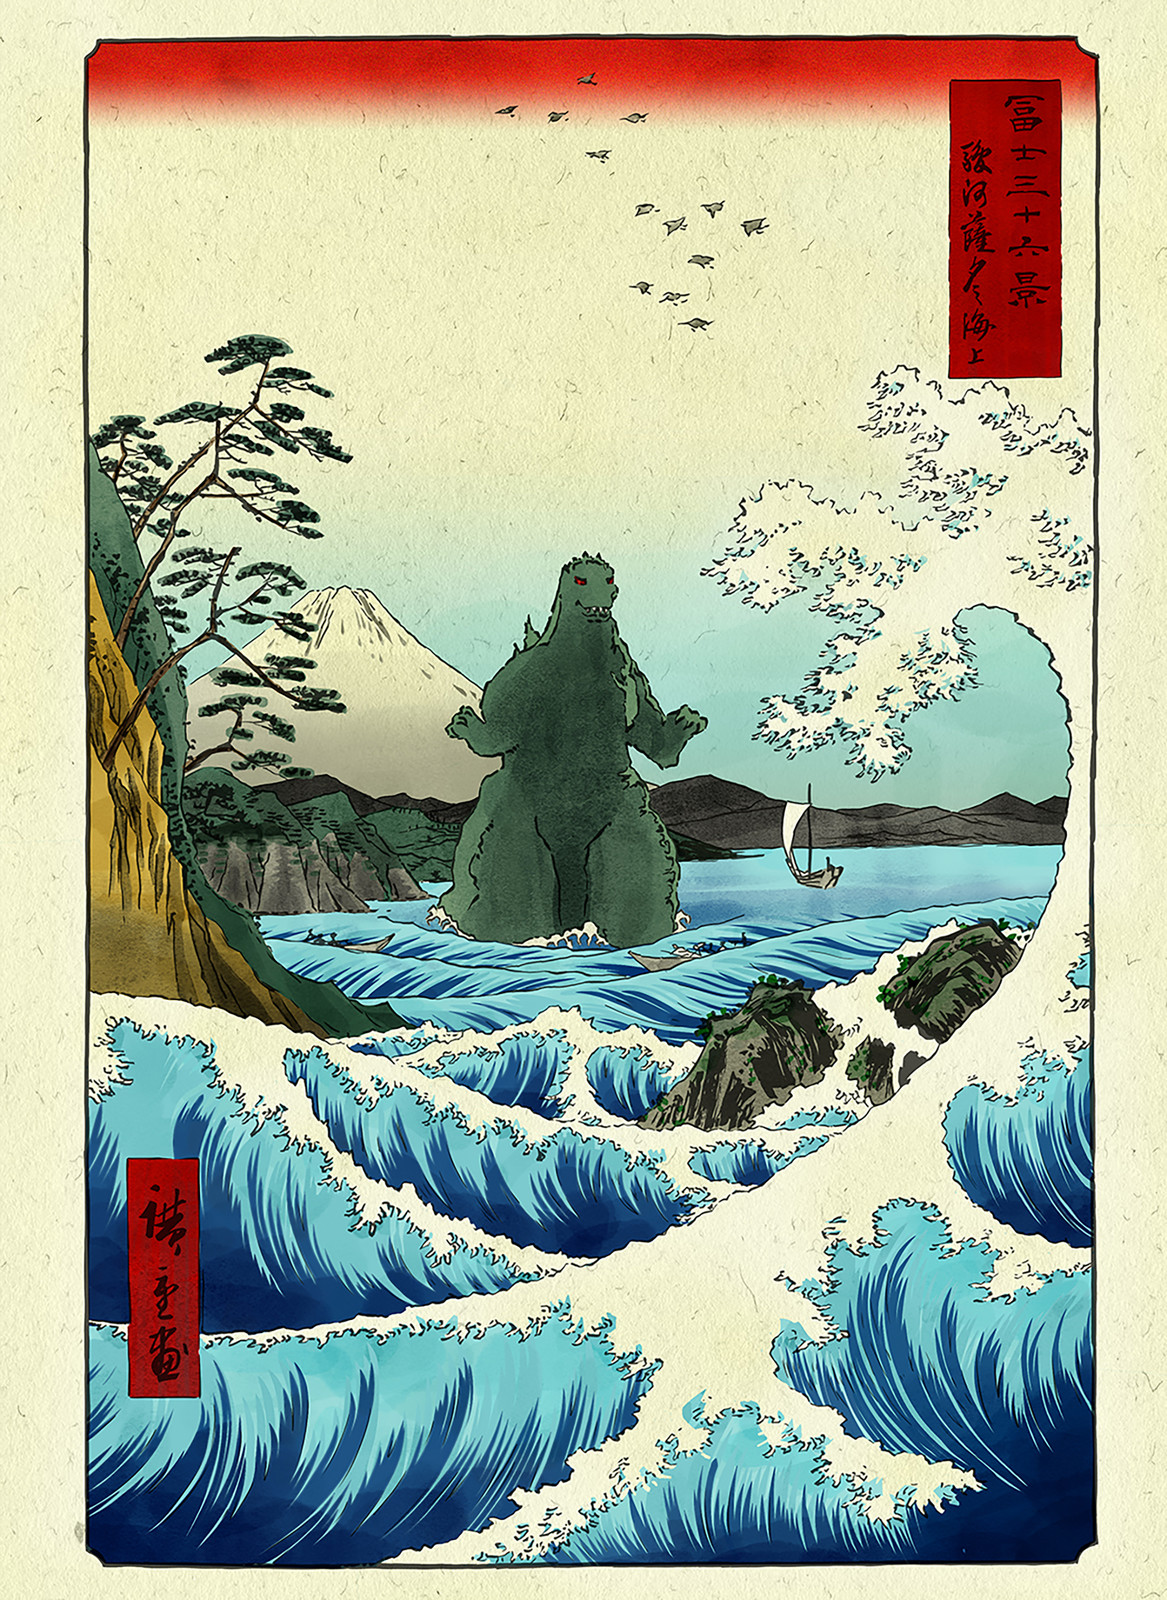 Kaiju Digital Woodcuts